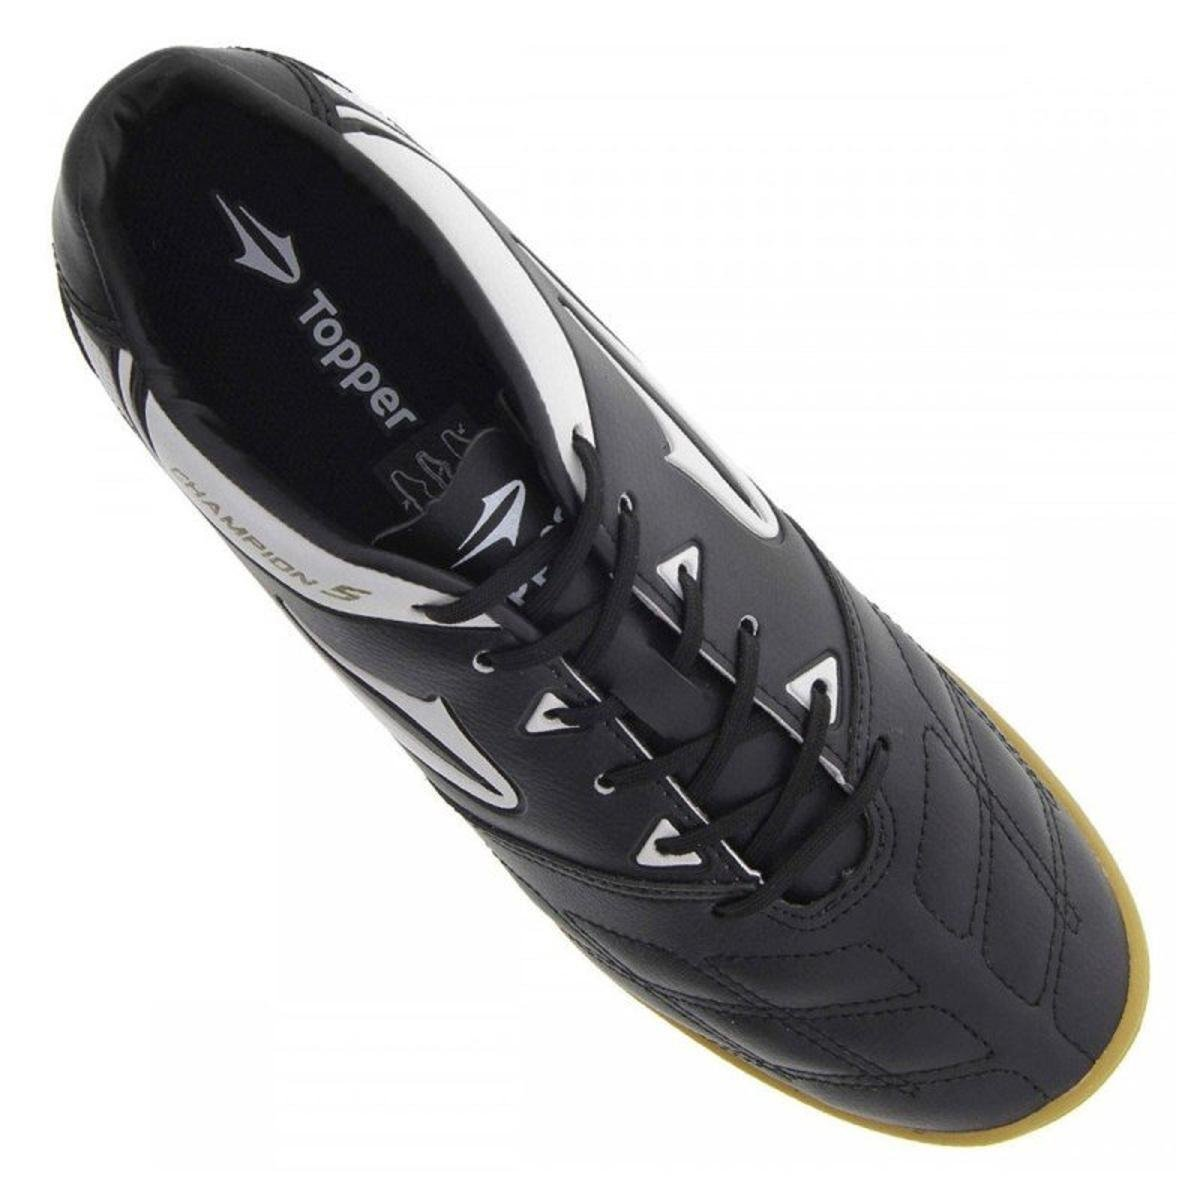 Chuteira Futsal Topper Champion 5 4136534 - Compre Agora  04afcdf9ecf8a